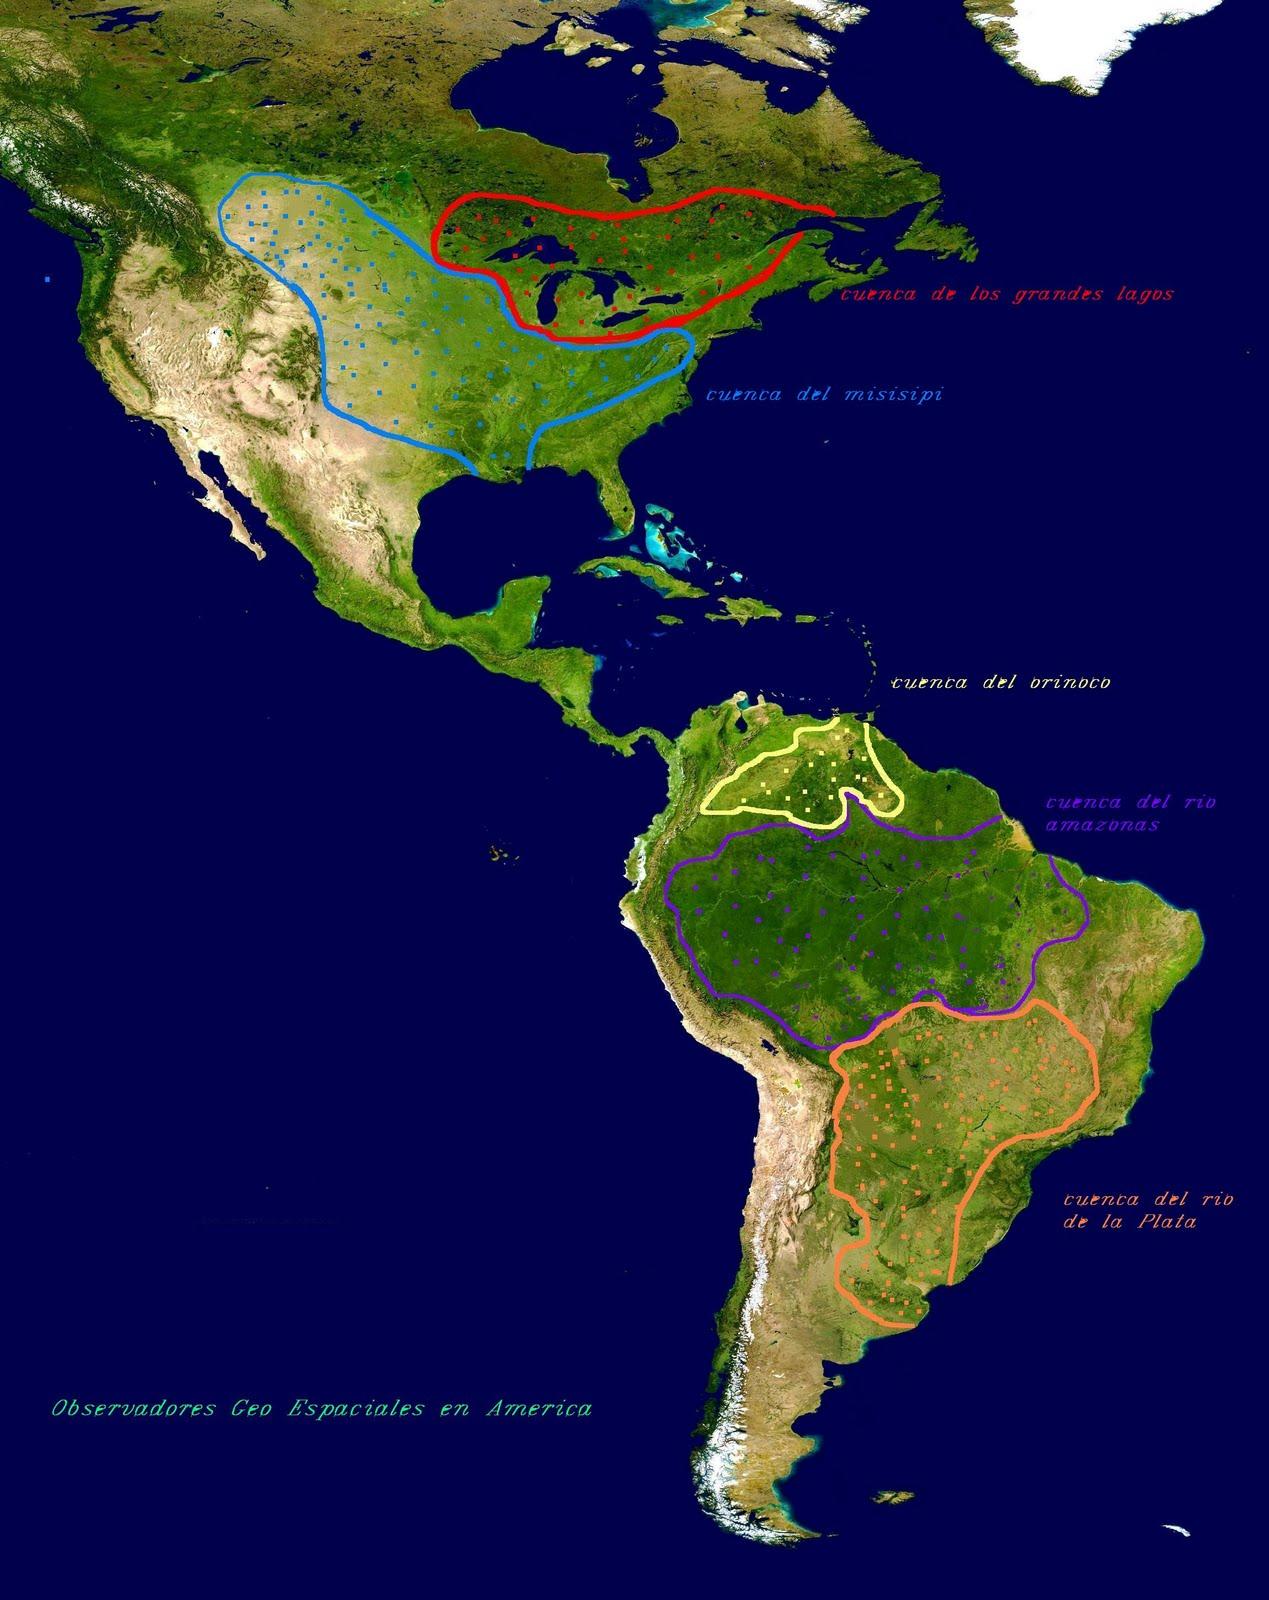 http://3.bp.blogspot.com/-E9hU6B2VinQ/TcnwSPfKdBI/AAAAAAAAACw/cnc_05sUrrI/s1600/mapa-google-mapa-america+%25281%2529.jpg